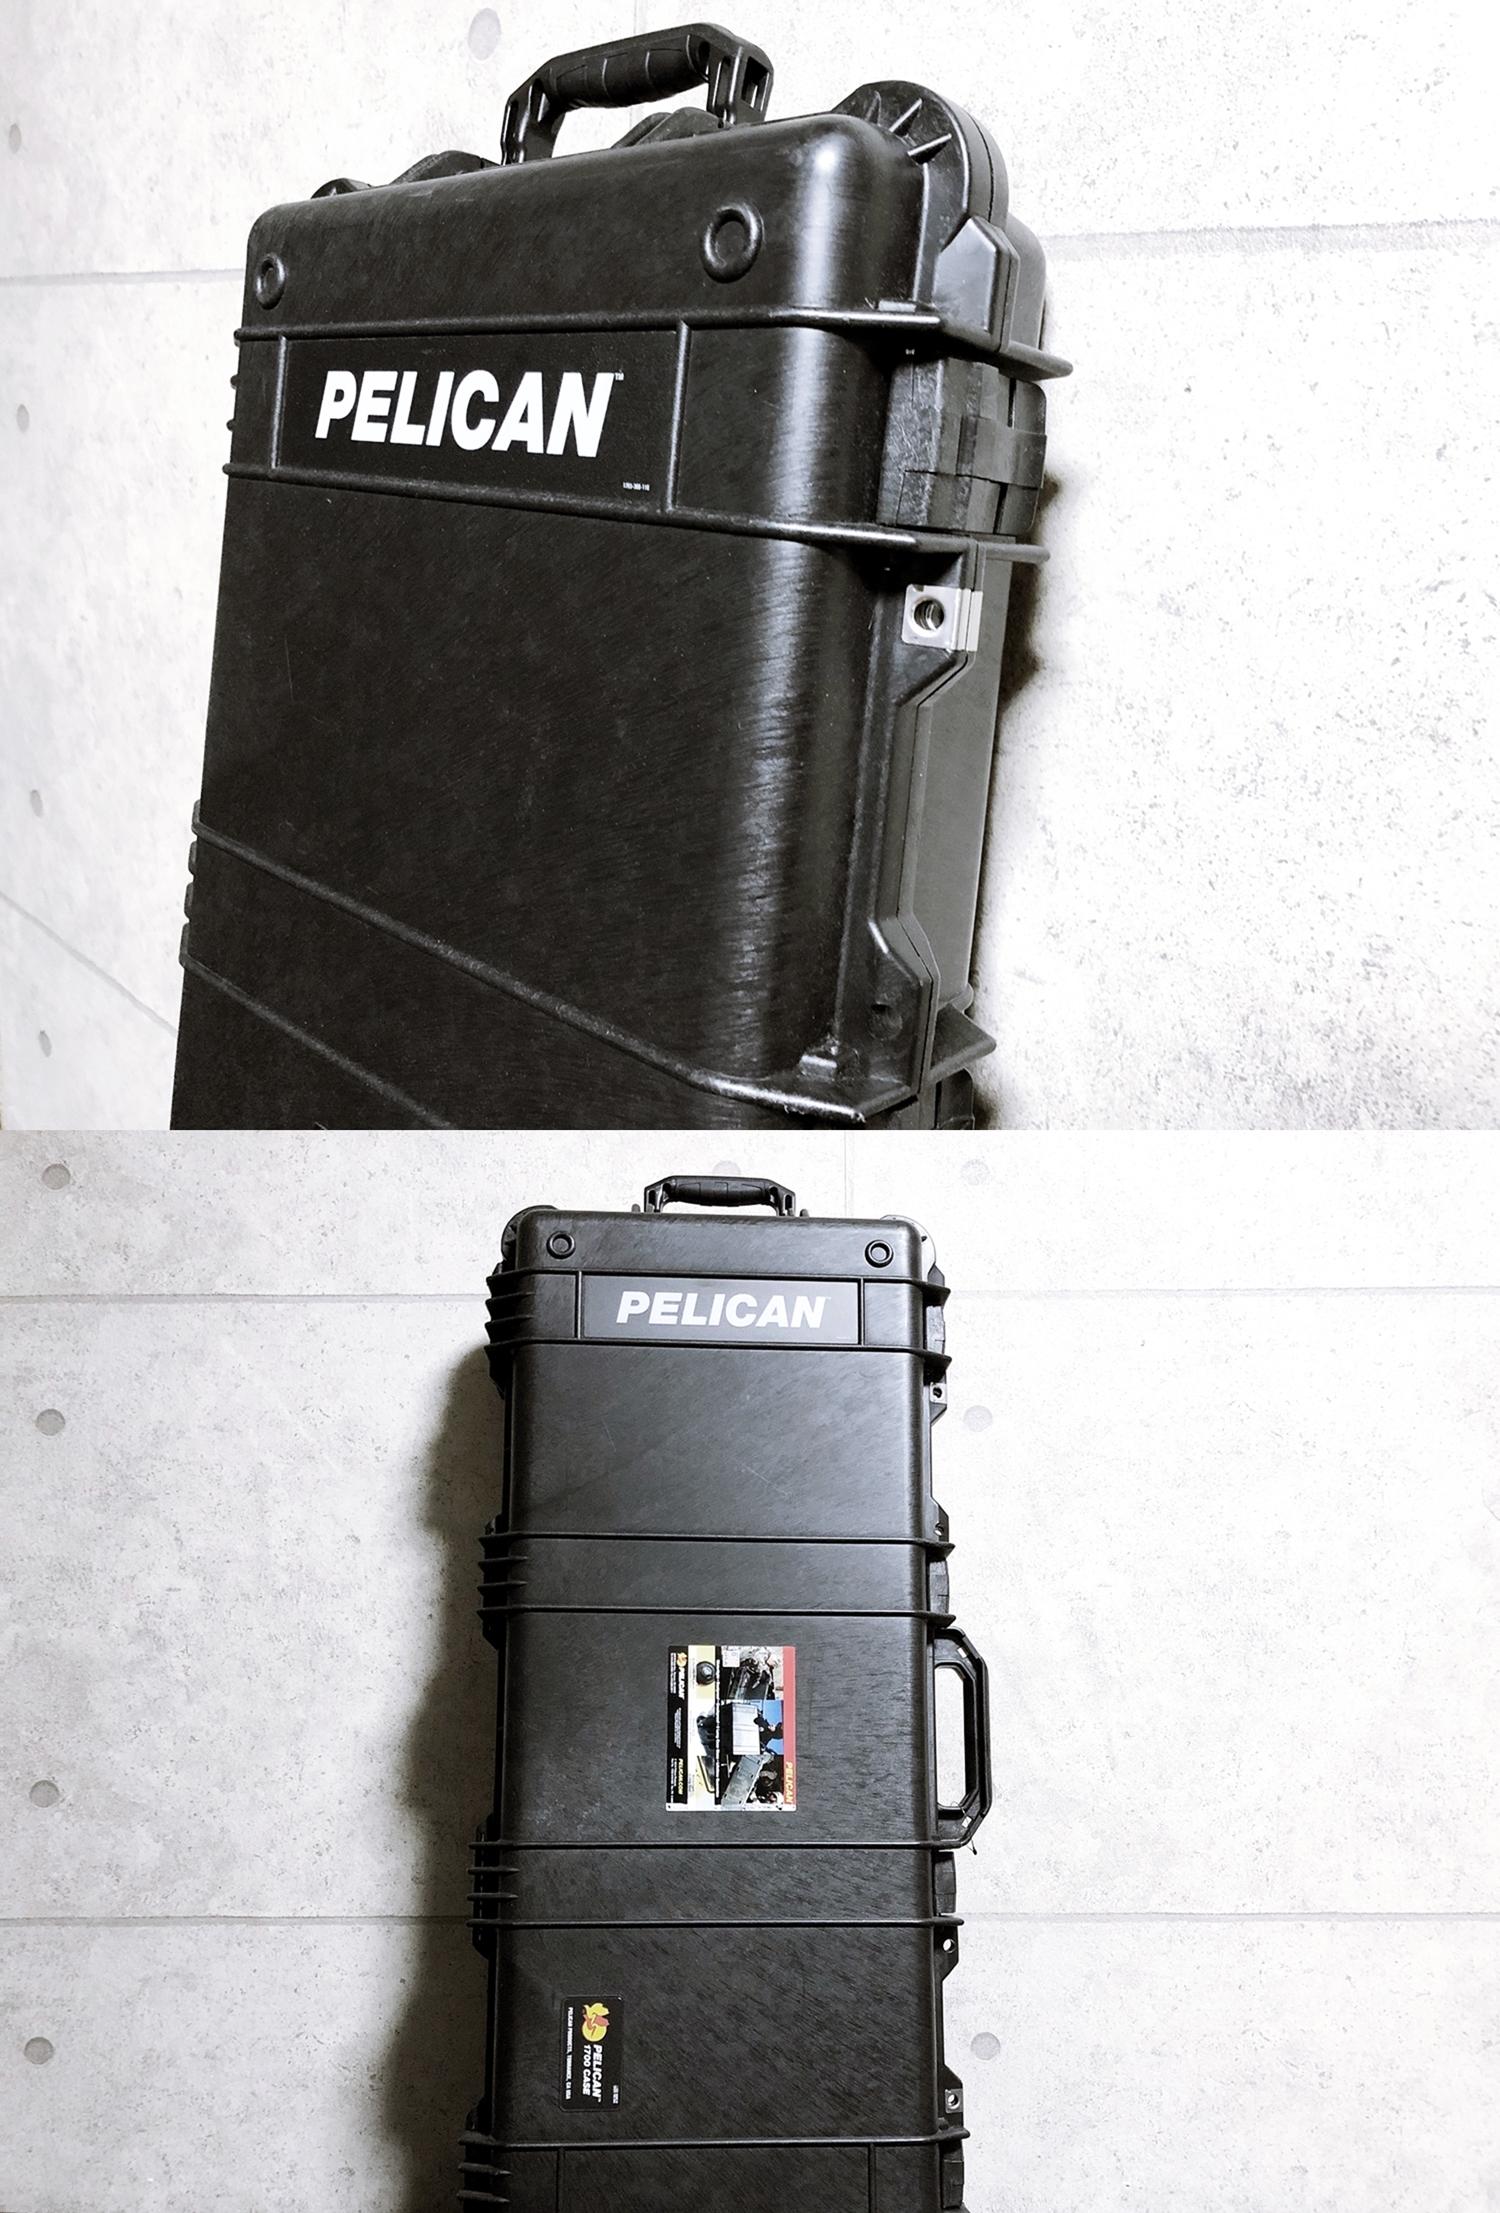 15 PELICAN 1700 PROTECTOR LONG CASE GET!! スポンジカスタム 収納計画!! ペリカン ハードケース ガンケース 購入 開封 レビュー!!